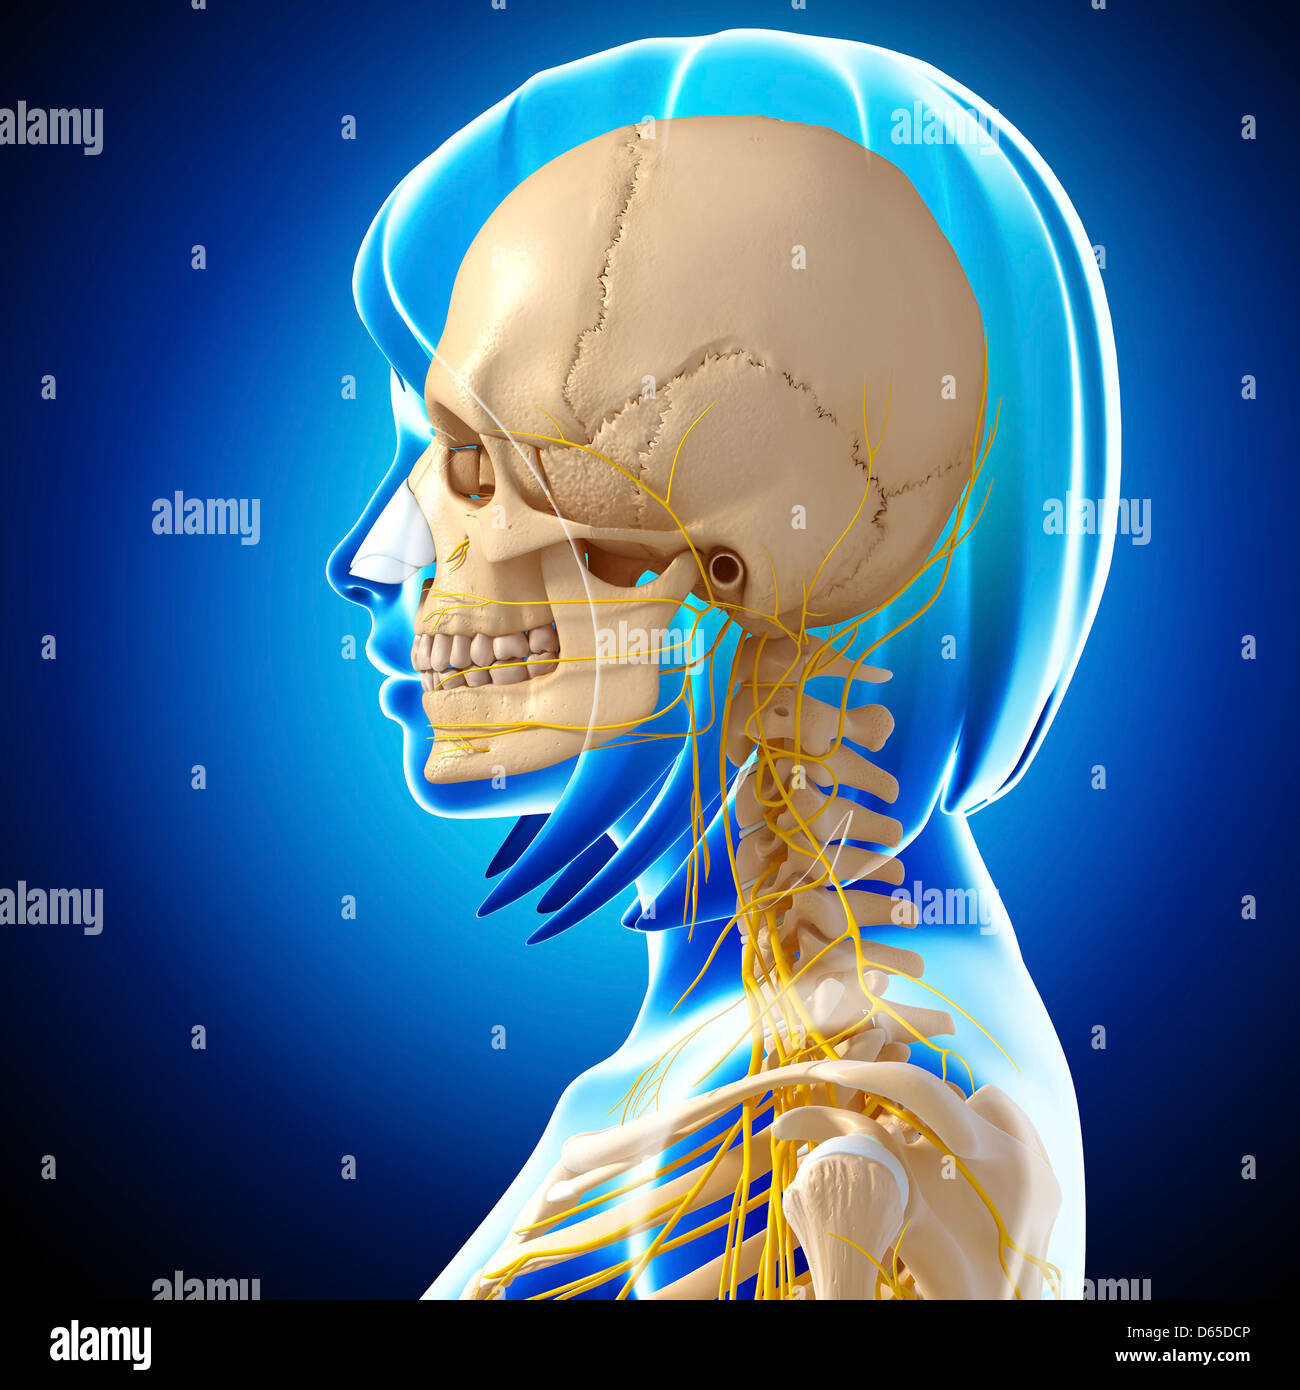 Head And Neck Anatomy Stockfotos & Head And Neck Anatomy Bilder - Alamy